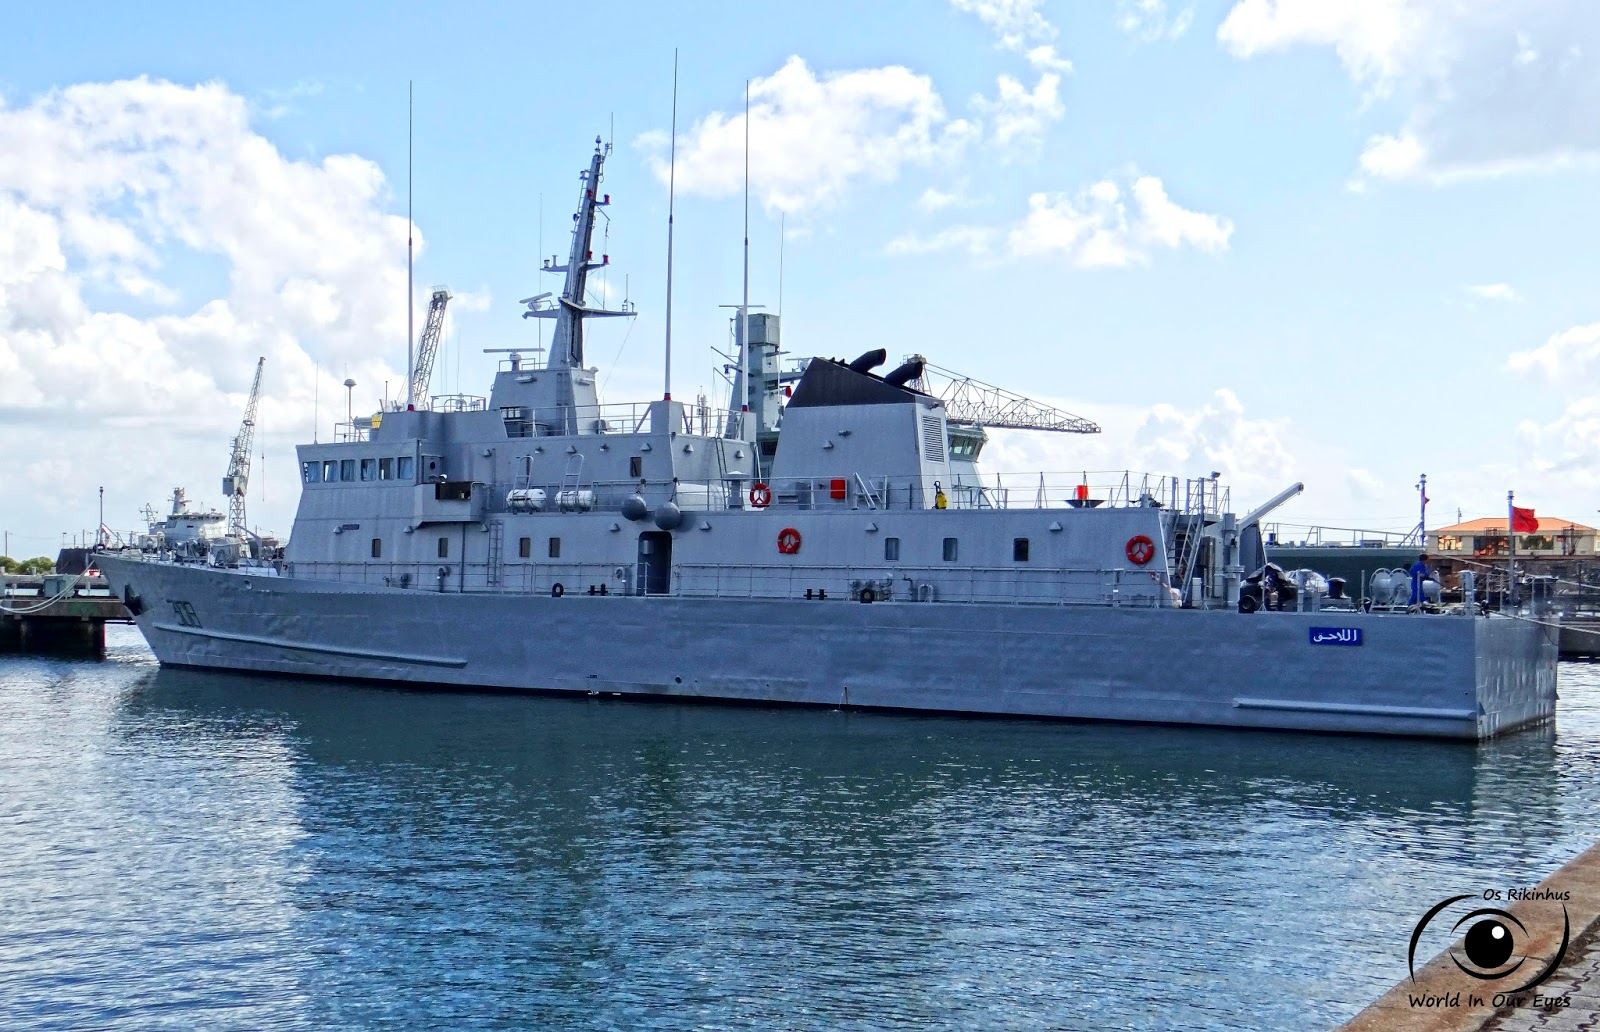 Royal Moroccan Navy Patrol Boats / Patrouilleurs de la Marine Marocaine - Page 13 DSC05136%2BP.H.M%2BEllahiq